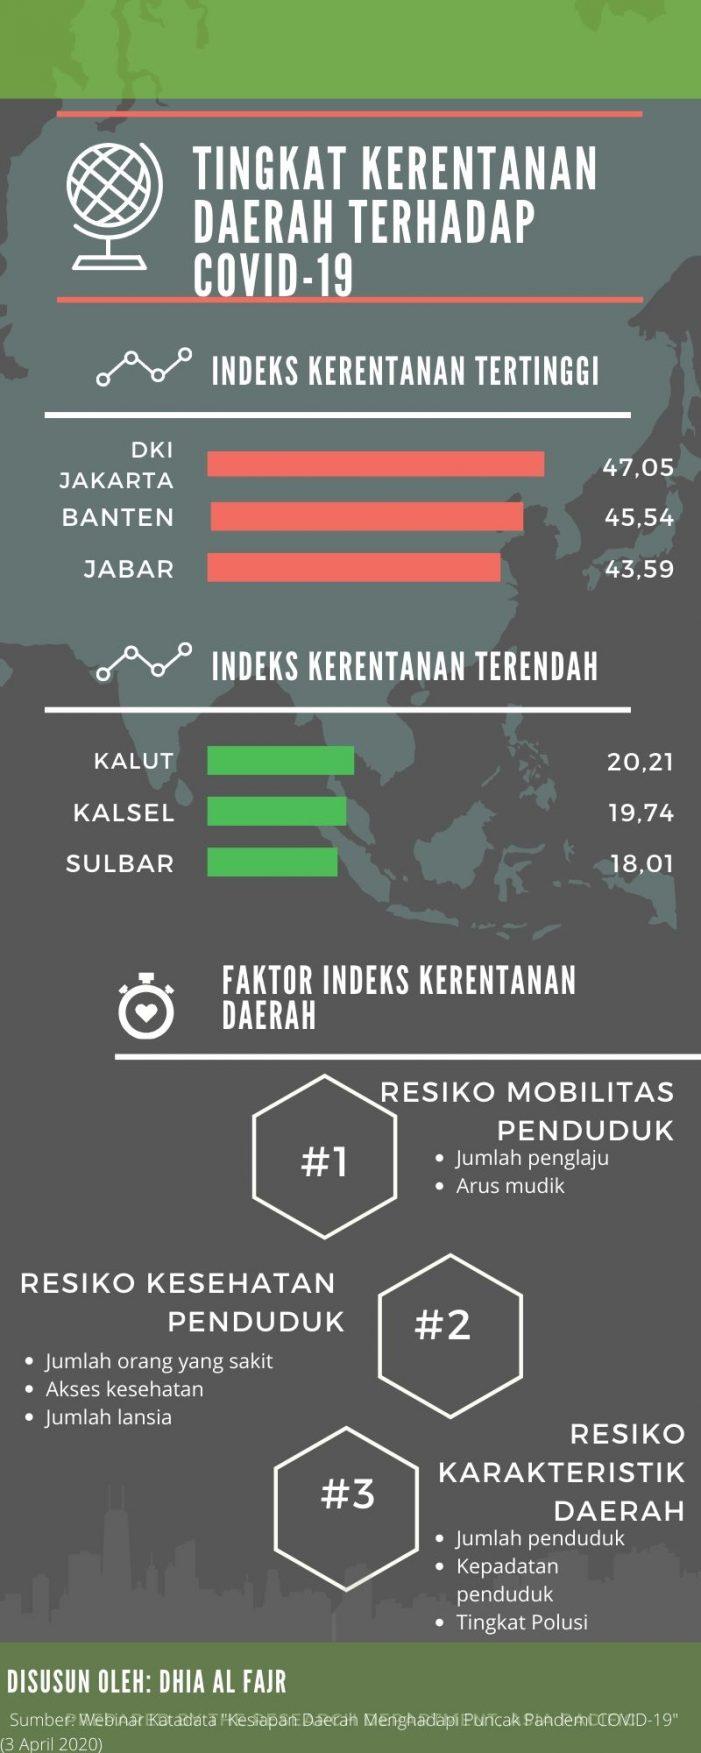 Webinar KATADATA: Provinsi dengan Indeks Kerentanan Tertinggi dan Terendah terhadap COVID-19